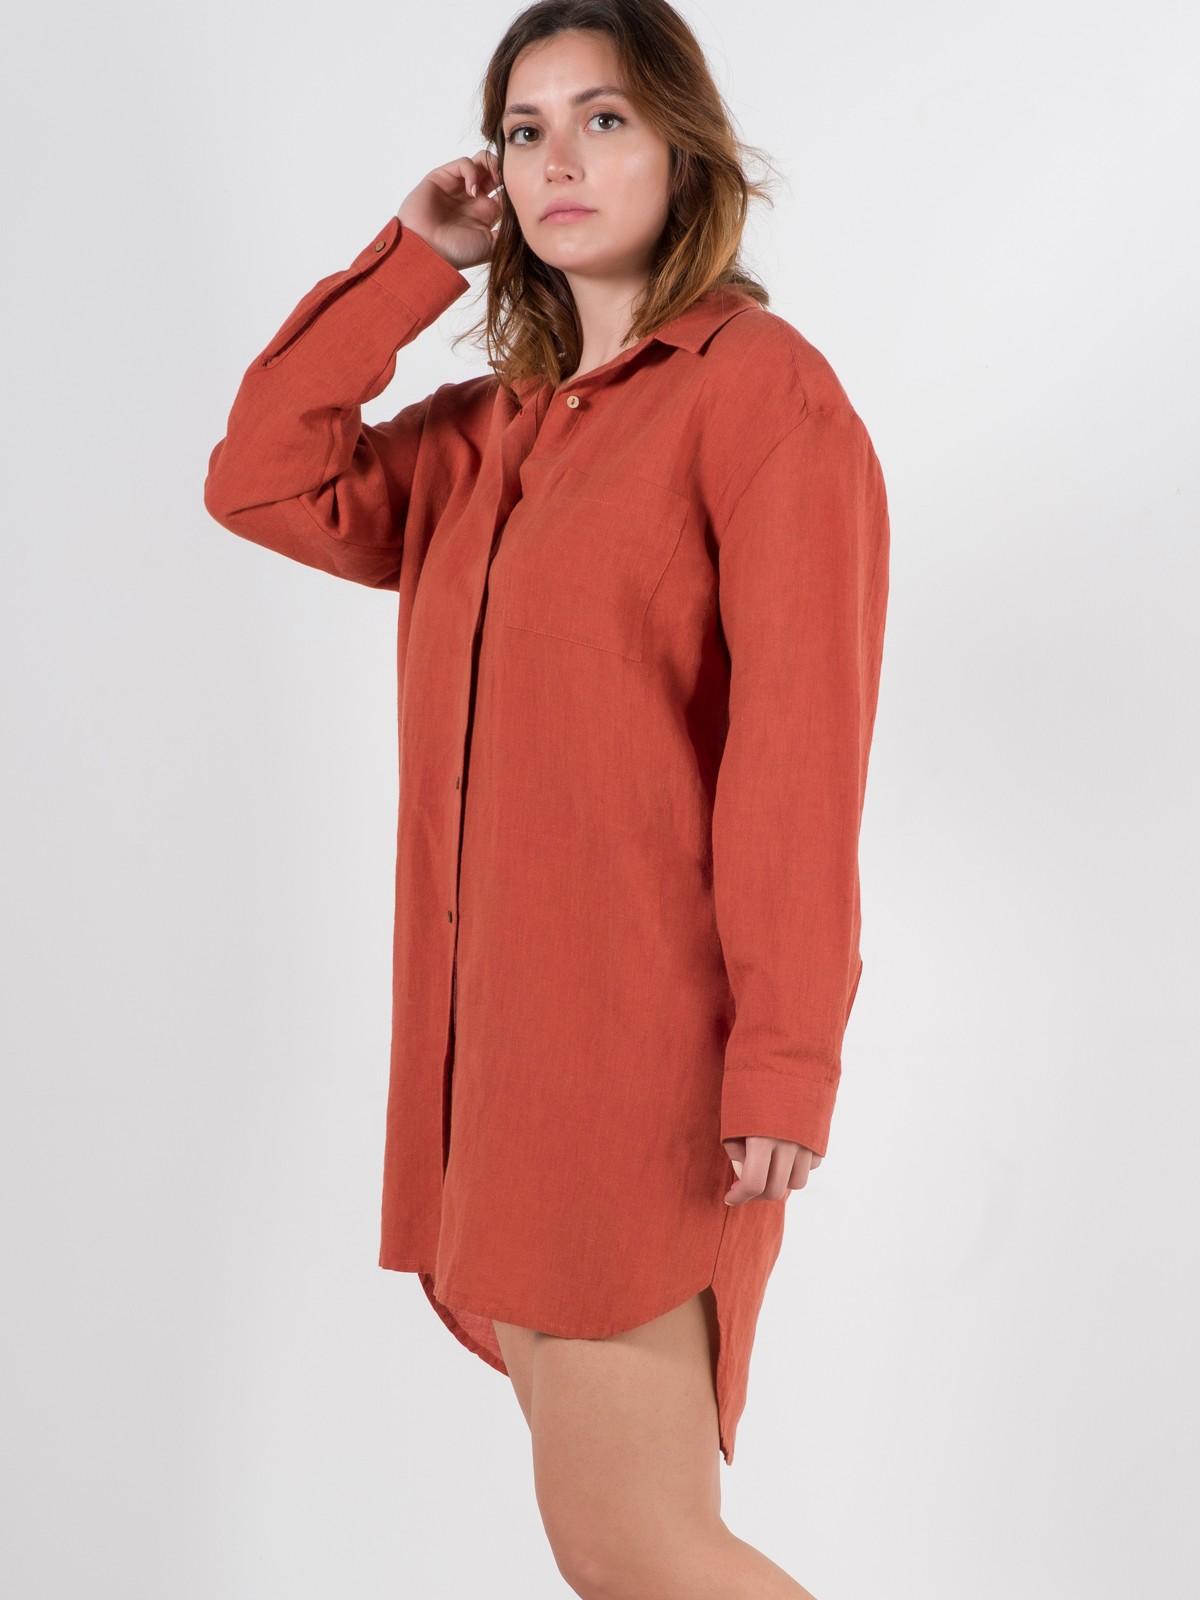 turuncu-gomlek-elbise3-1200x1600w